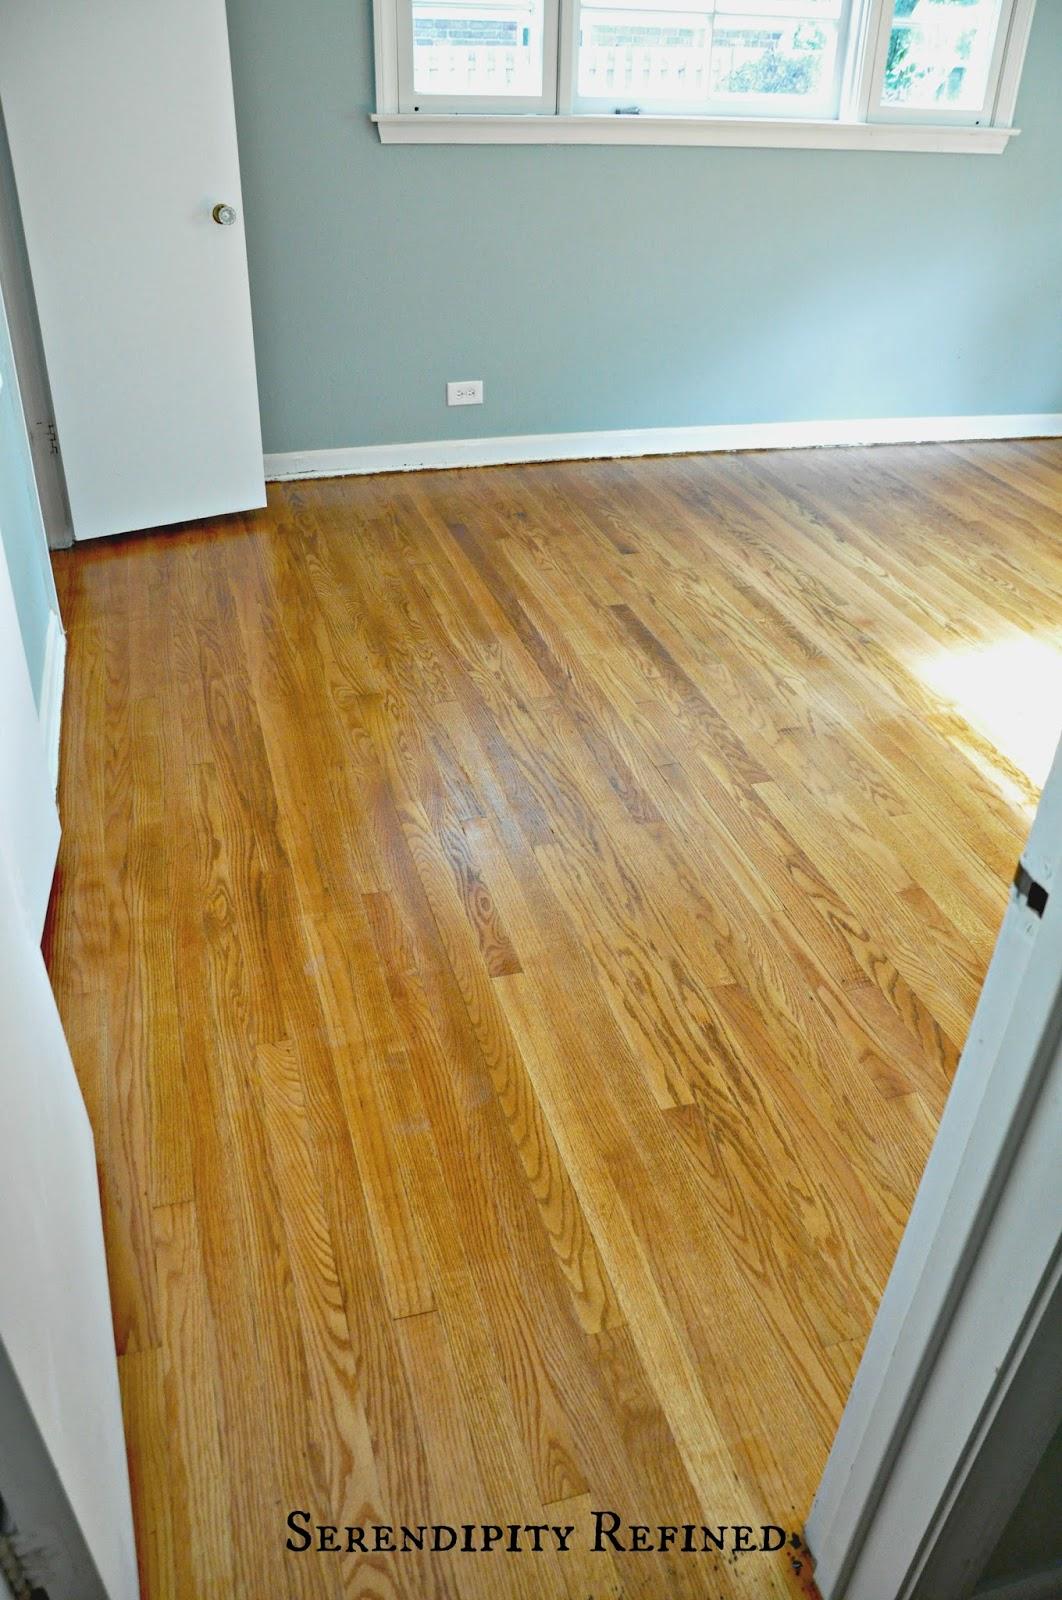 serendipity refined blog french farm house update refinishing hardwood floors